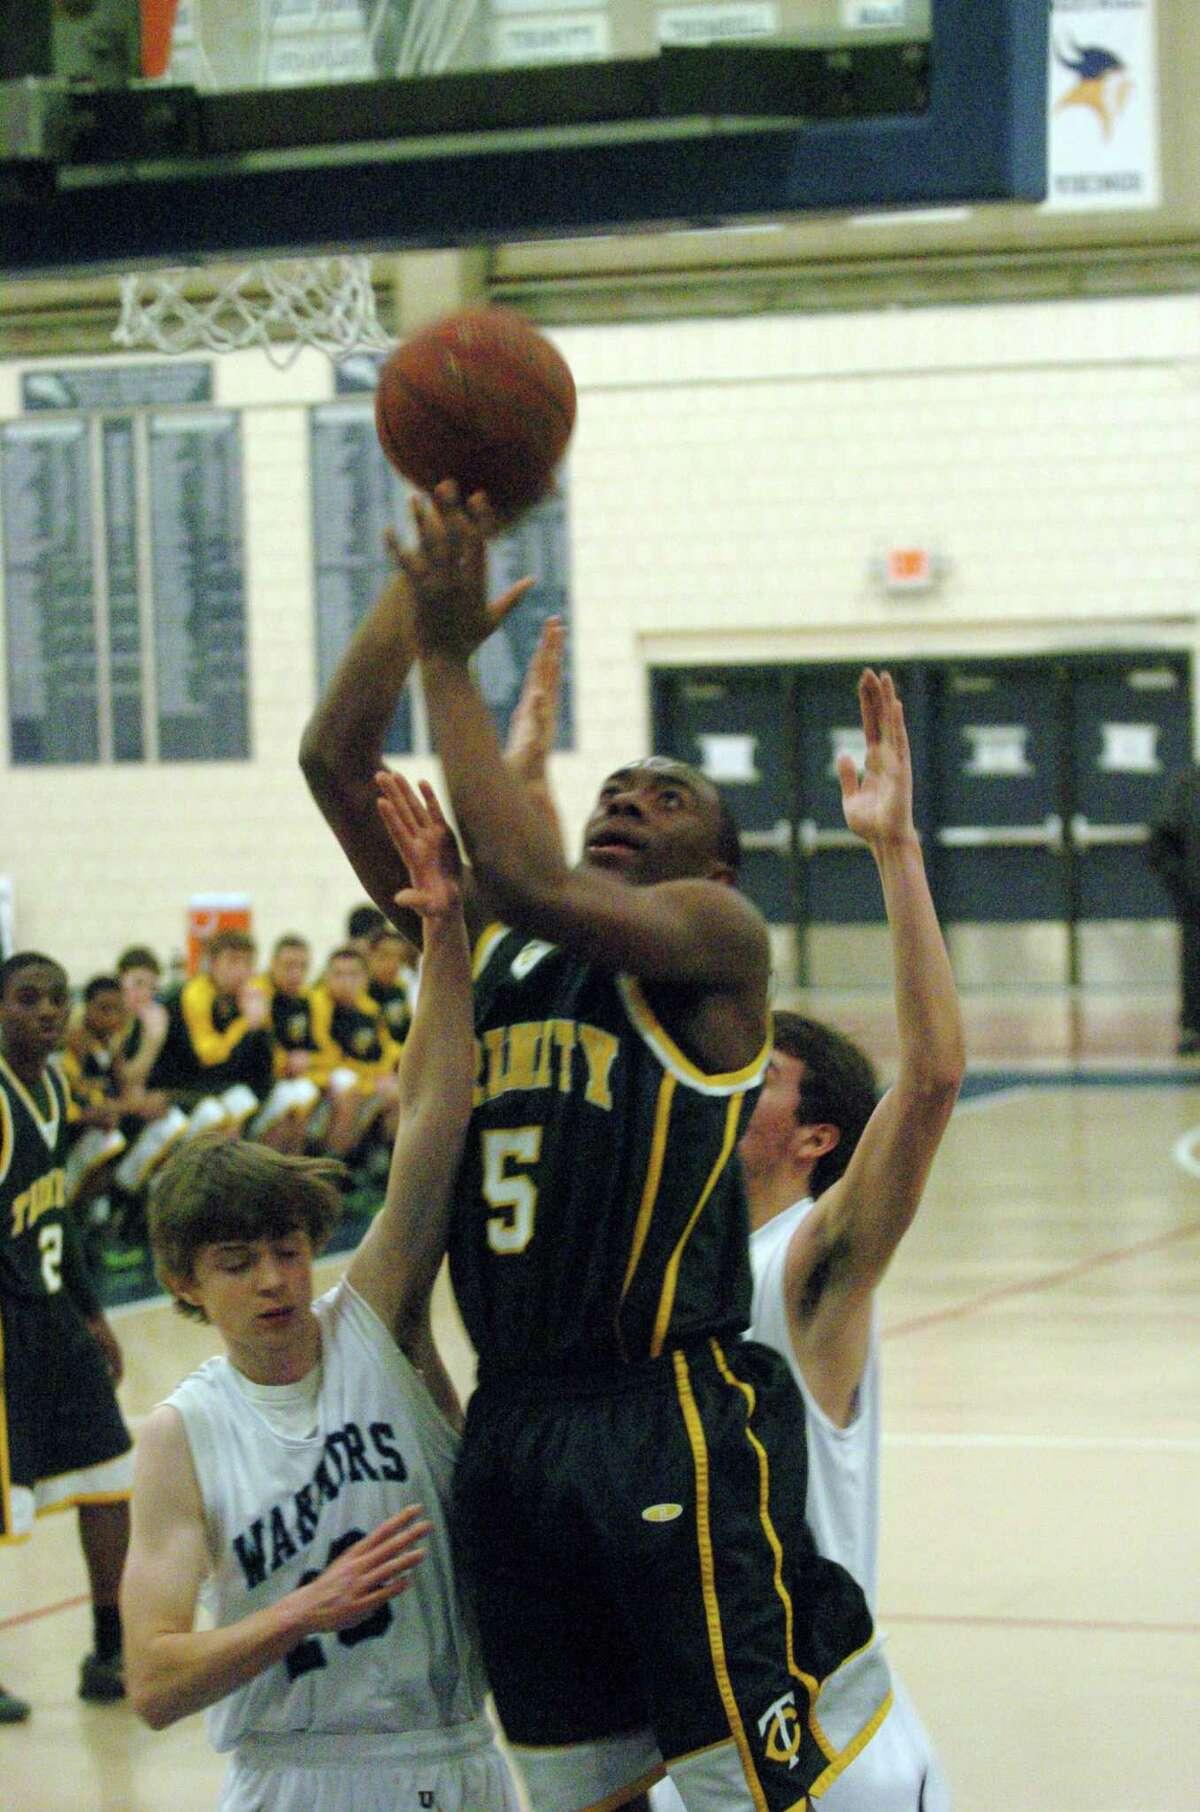 Trinity's Brandon Wheeler puts the ball up as Wilton's Chris Curtis defends as Wilton High School hosts Trinity Catholic in a boys basketball game in Wilton, Conn., Feb. 12, 2013.